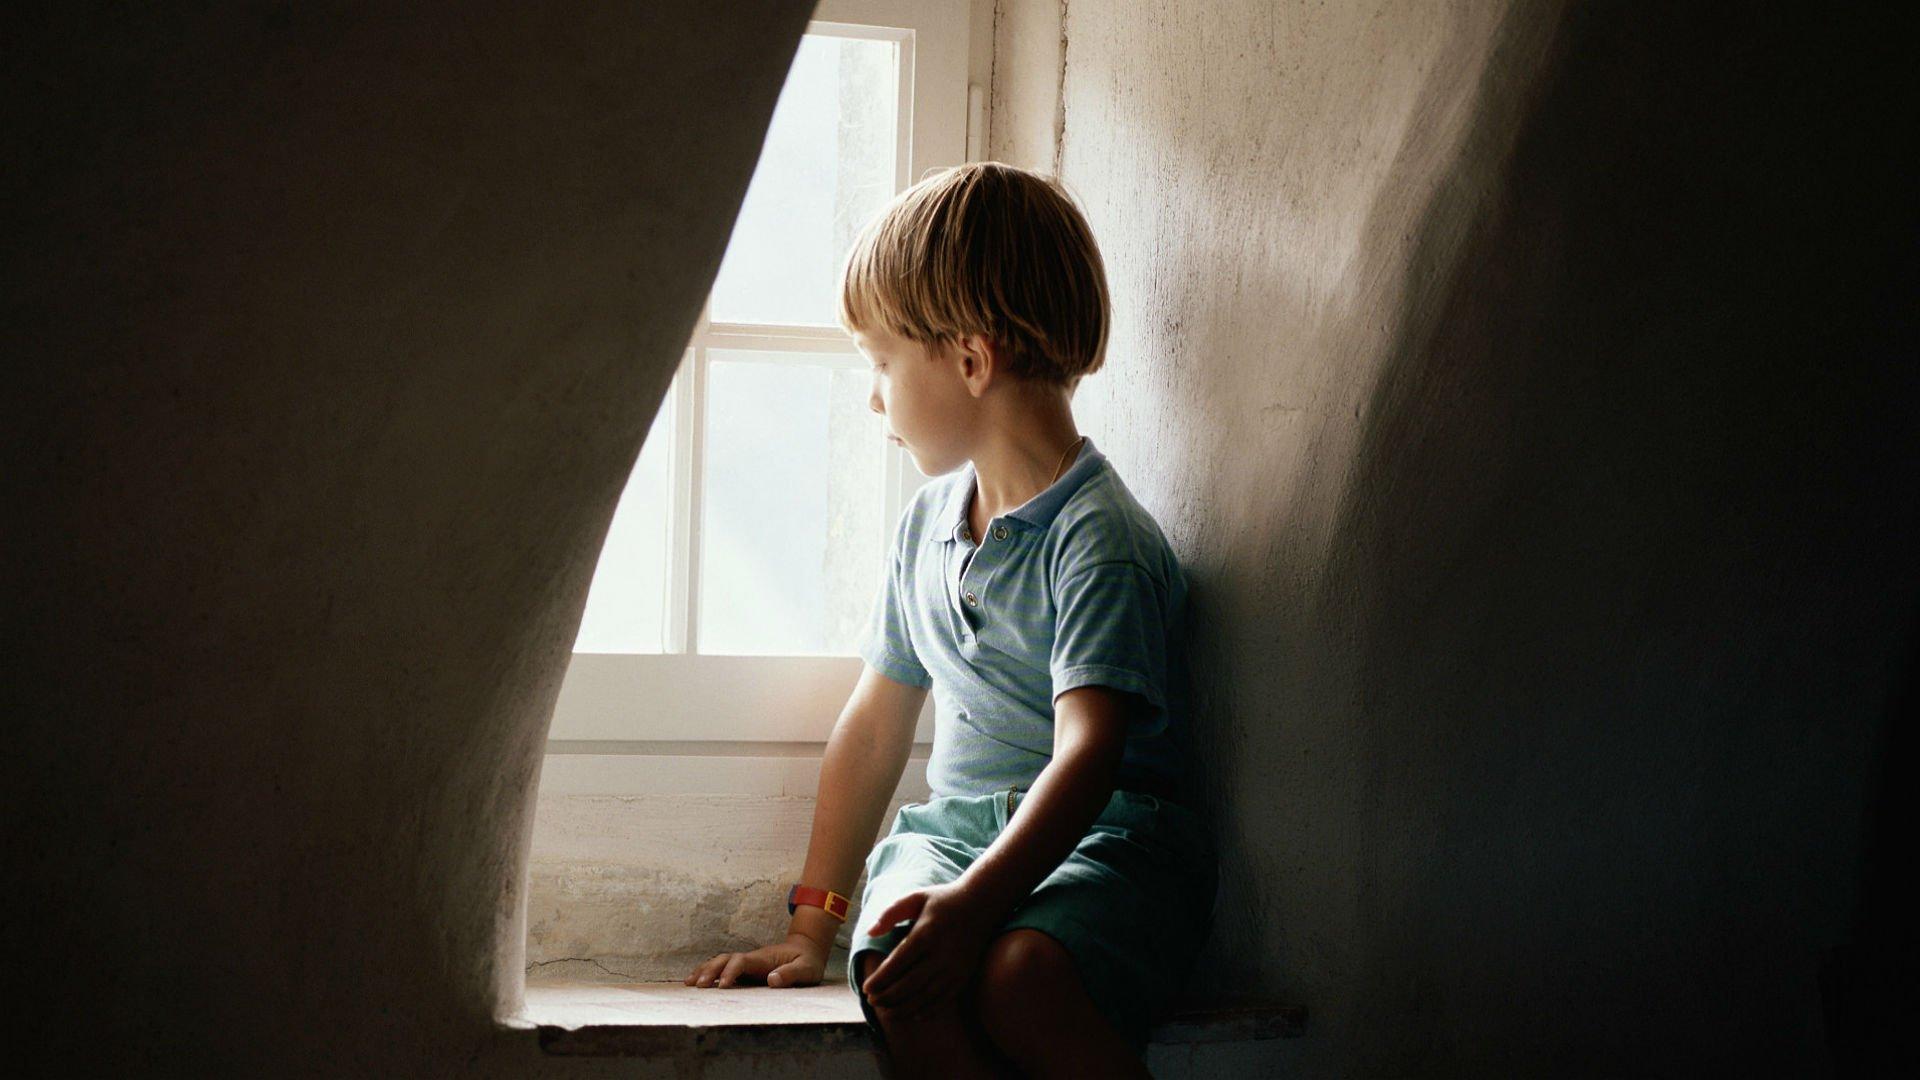 Image result for sad child in home wallpaper